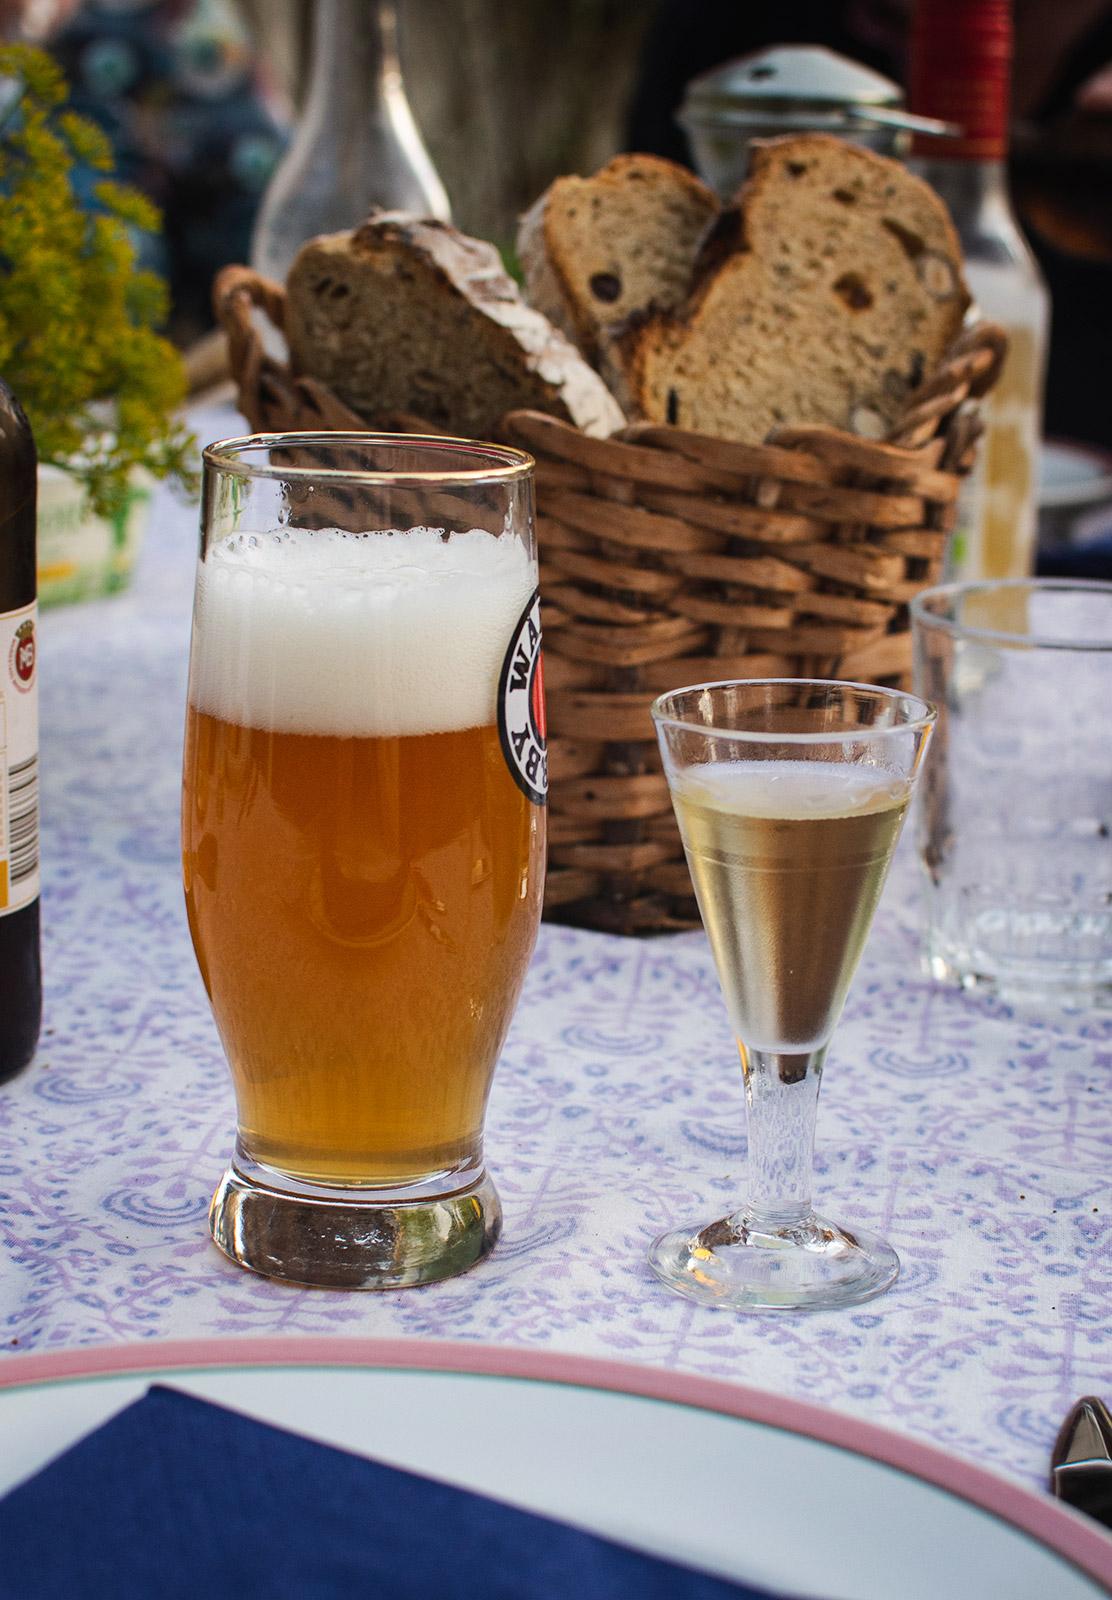 Beer and schnapps